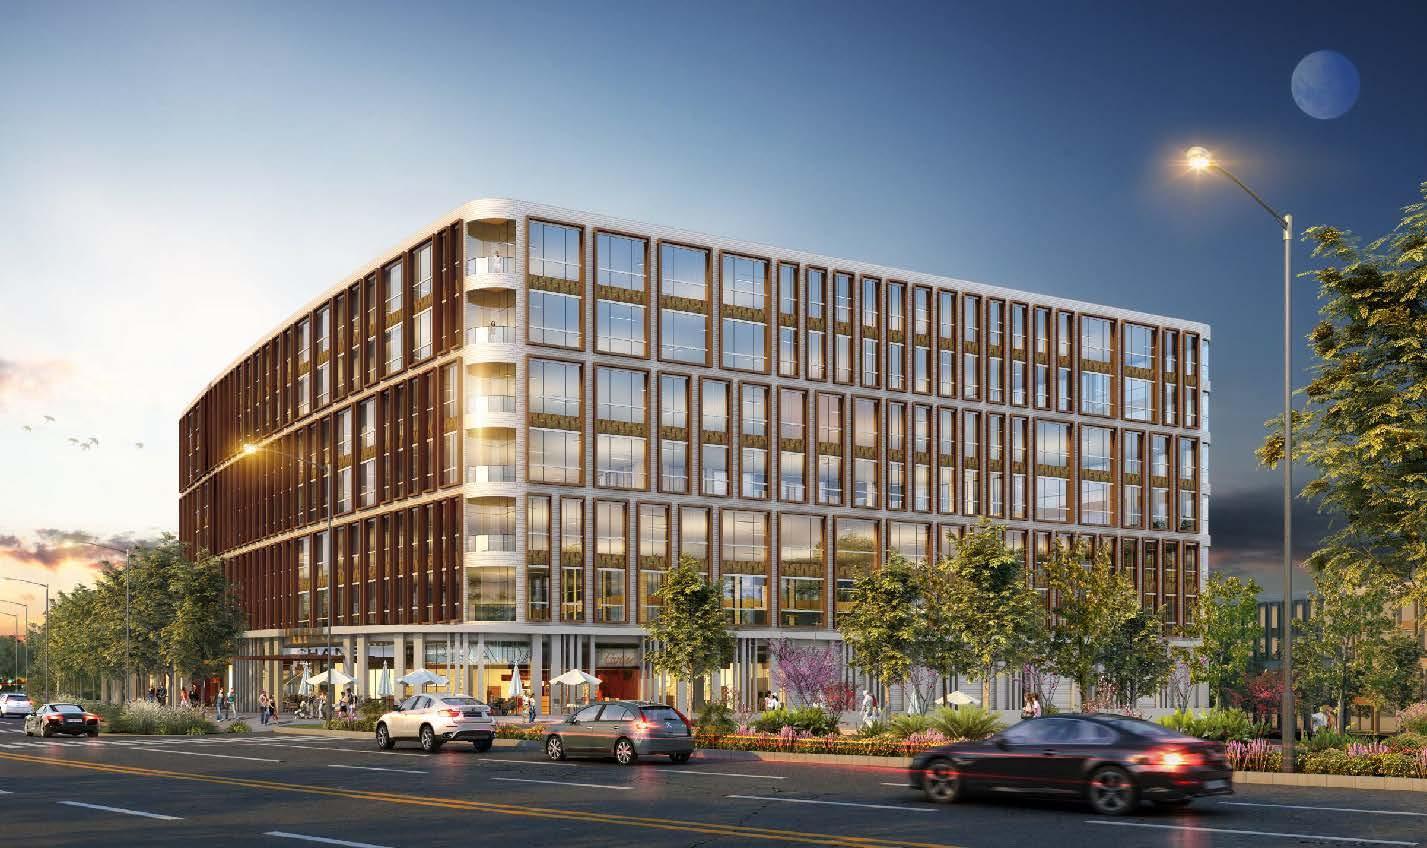 Done Deals: SDS Real Property and IG3 Real Estate Seek Development